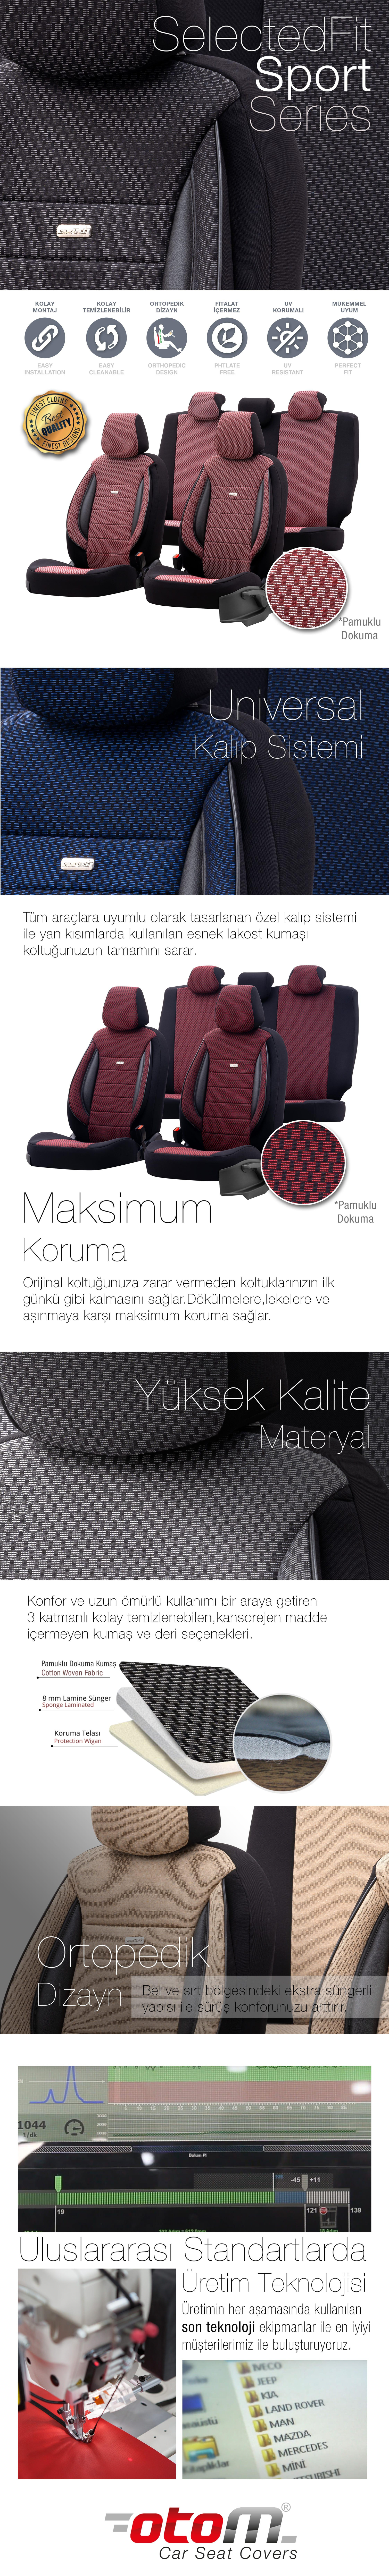 SelectedFit Sport Series Universal Oto koltuk Kılıfı